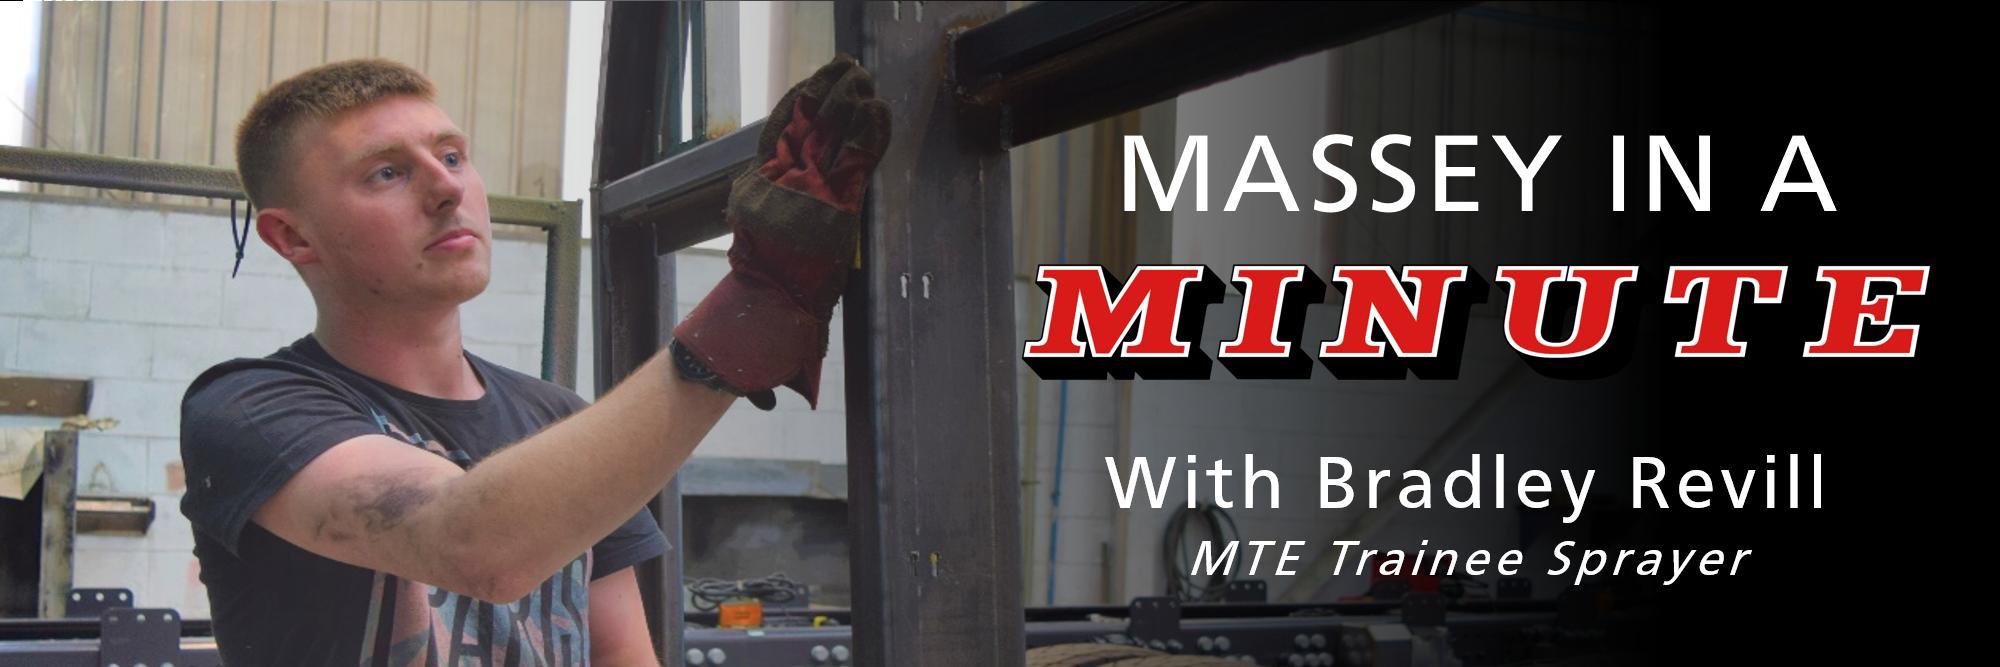 Massey in a Minute – Bradley Revill